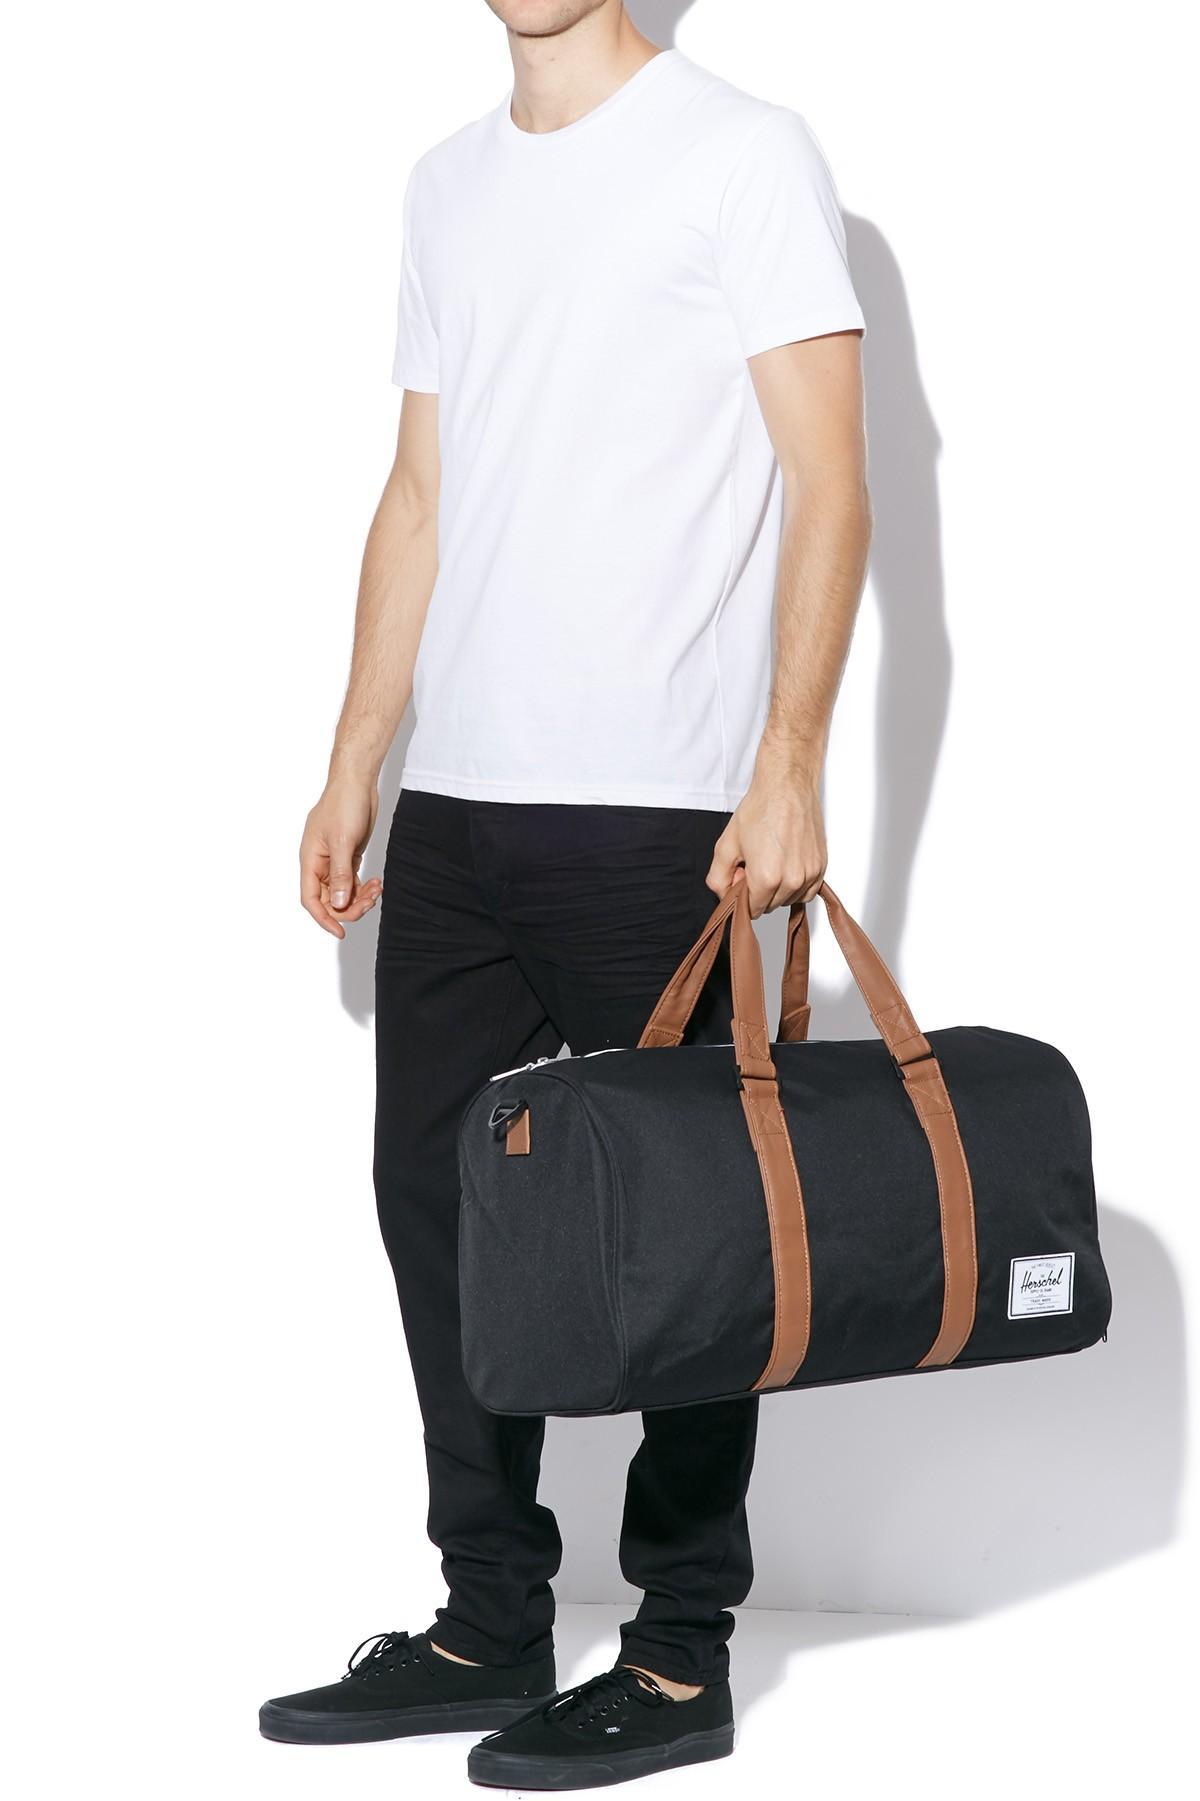 ad229b9c3019 Singapore. Herschel Supply Co. Novel Duffle Bag Weekend Gym Workout Bag  Full Volume 42.5L